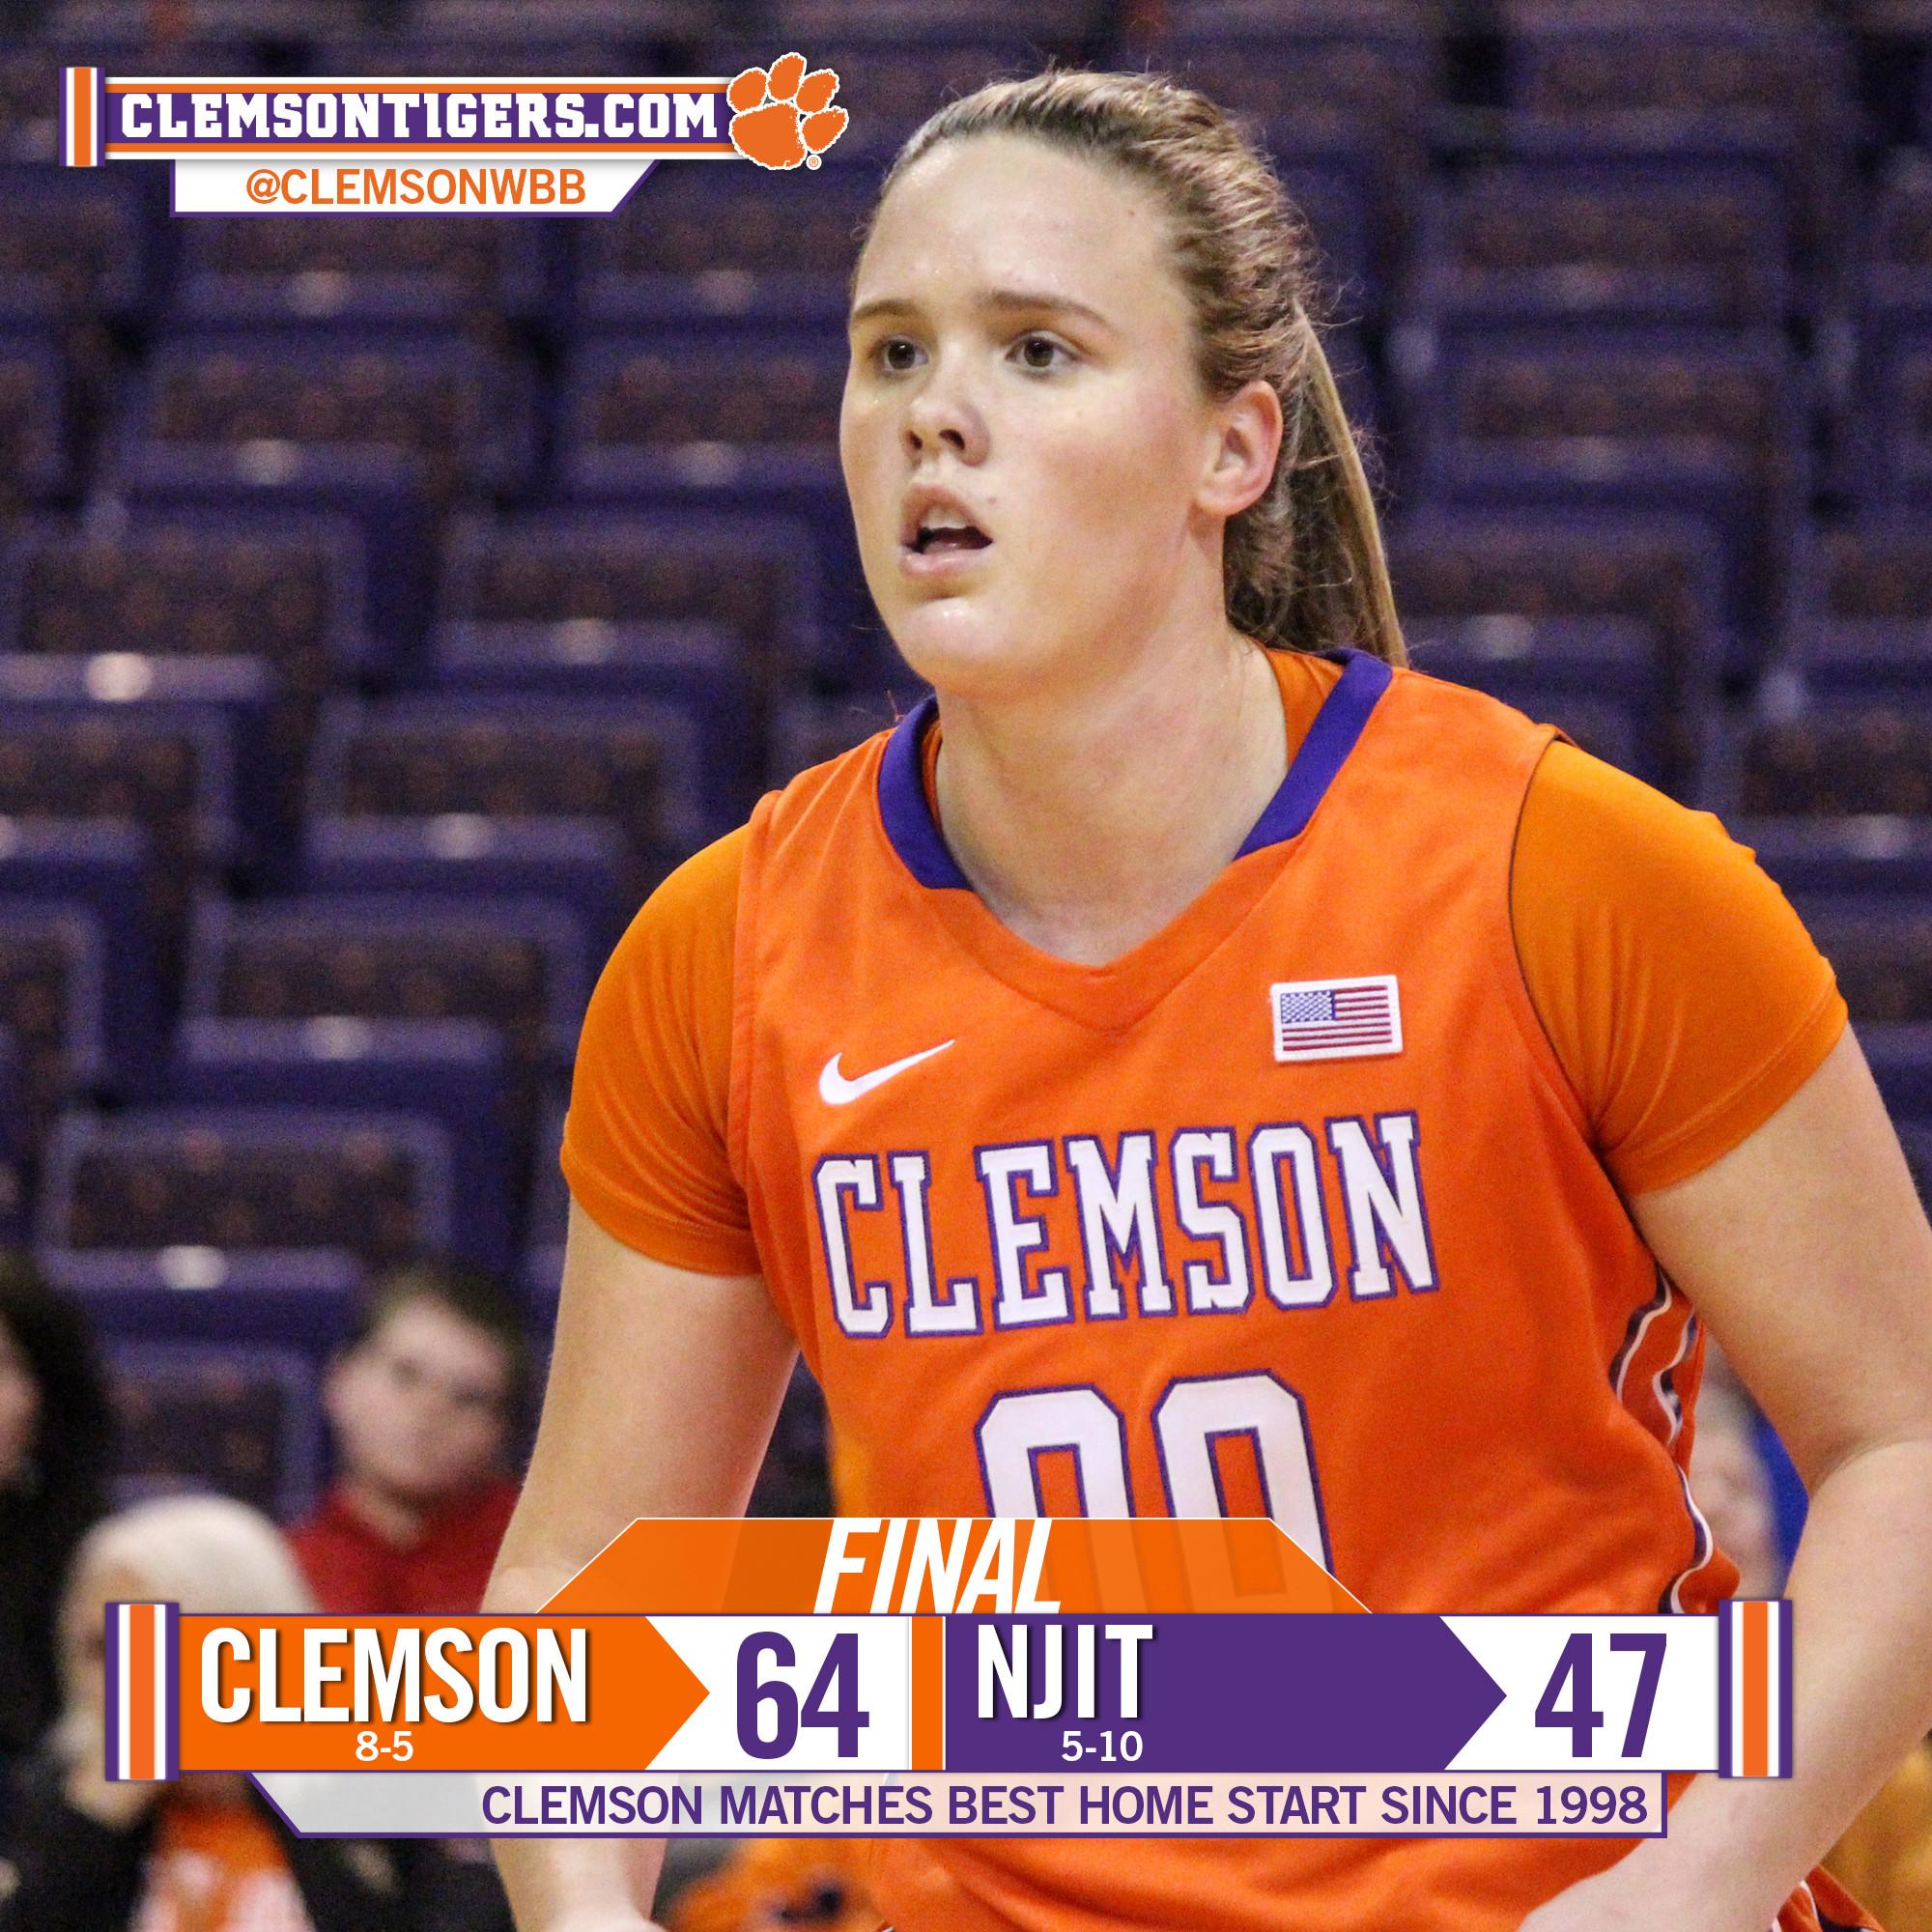 Clemson Tops NJIT, 64-47